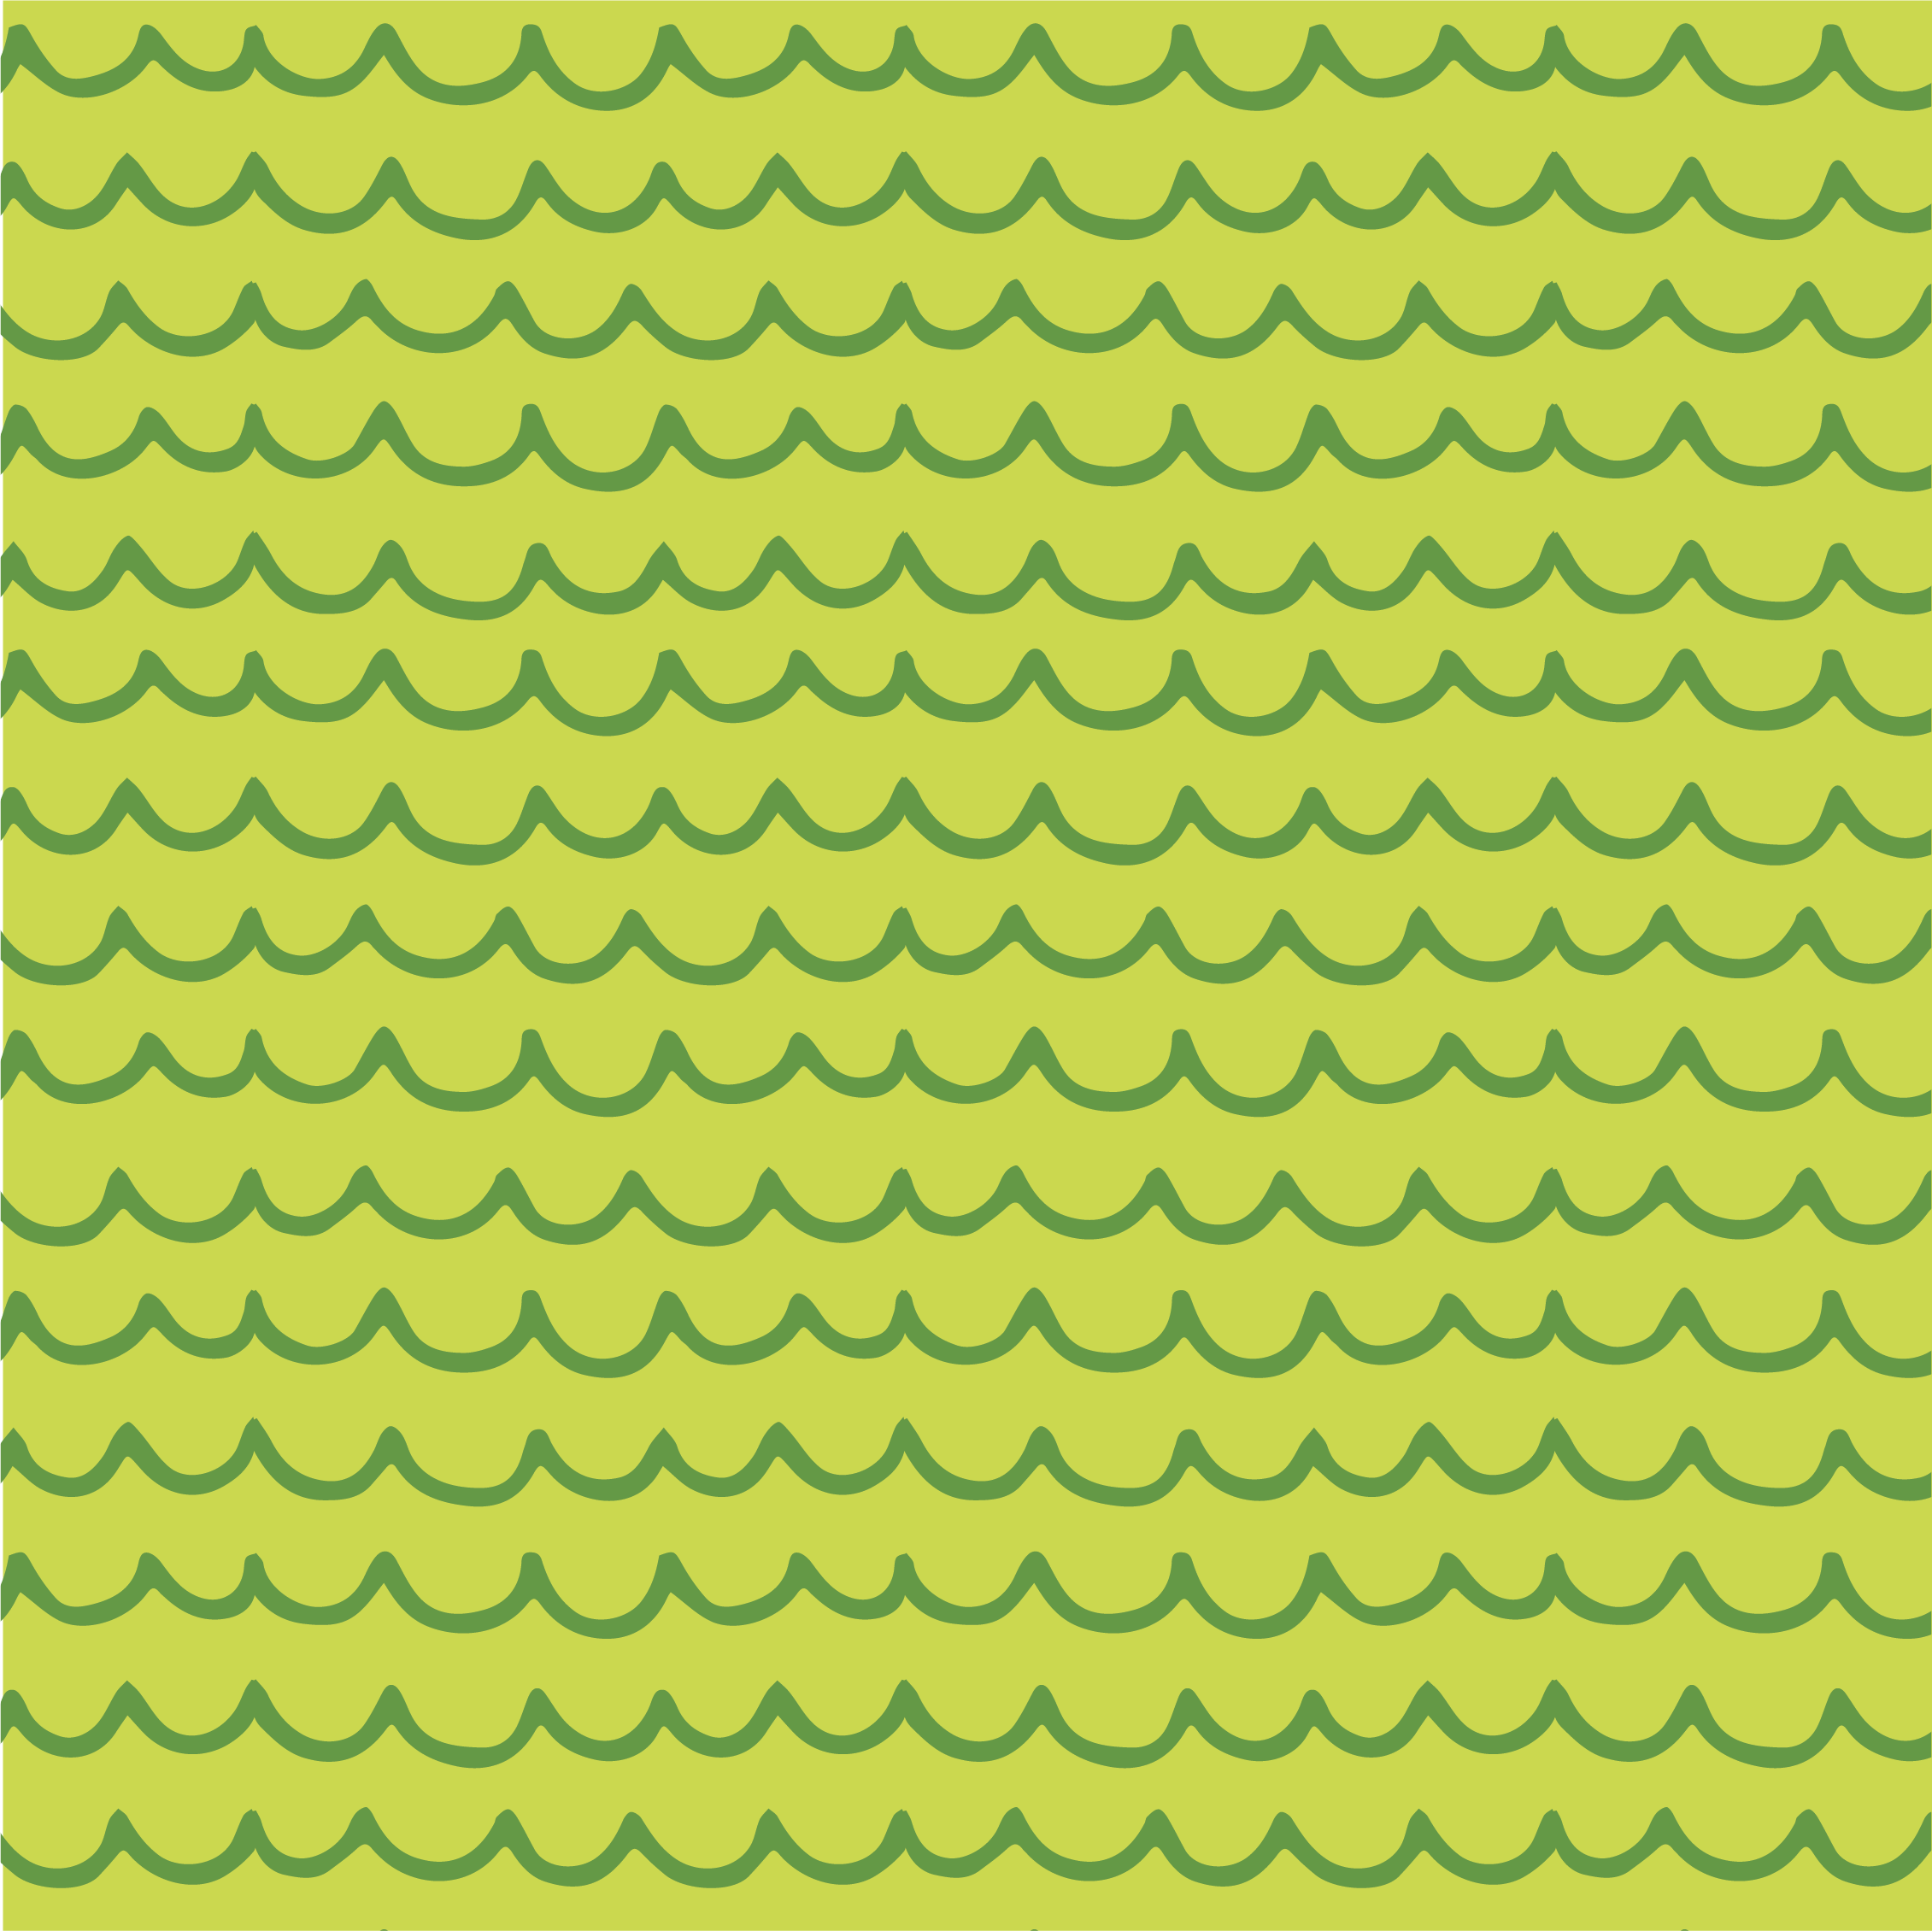 logo_motifs-07.png